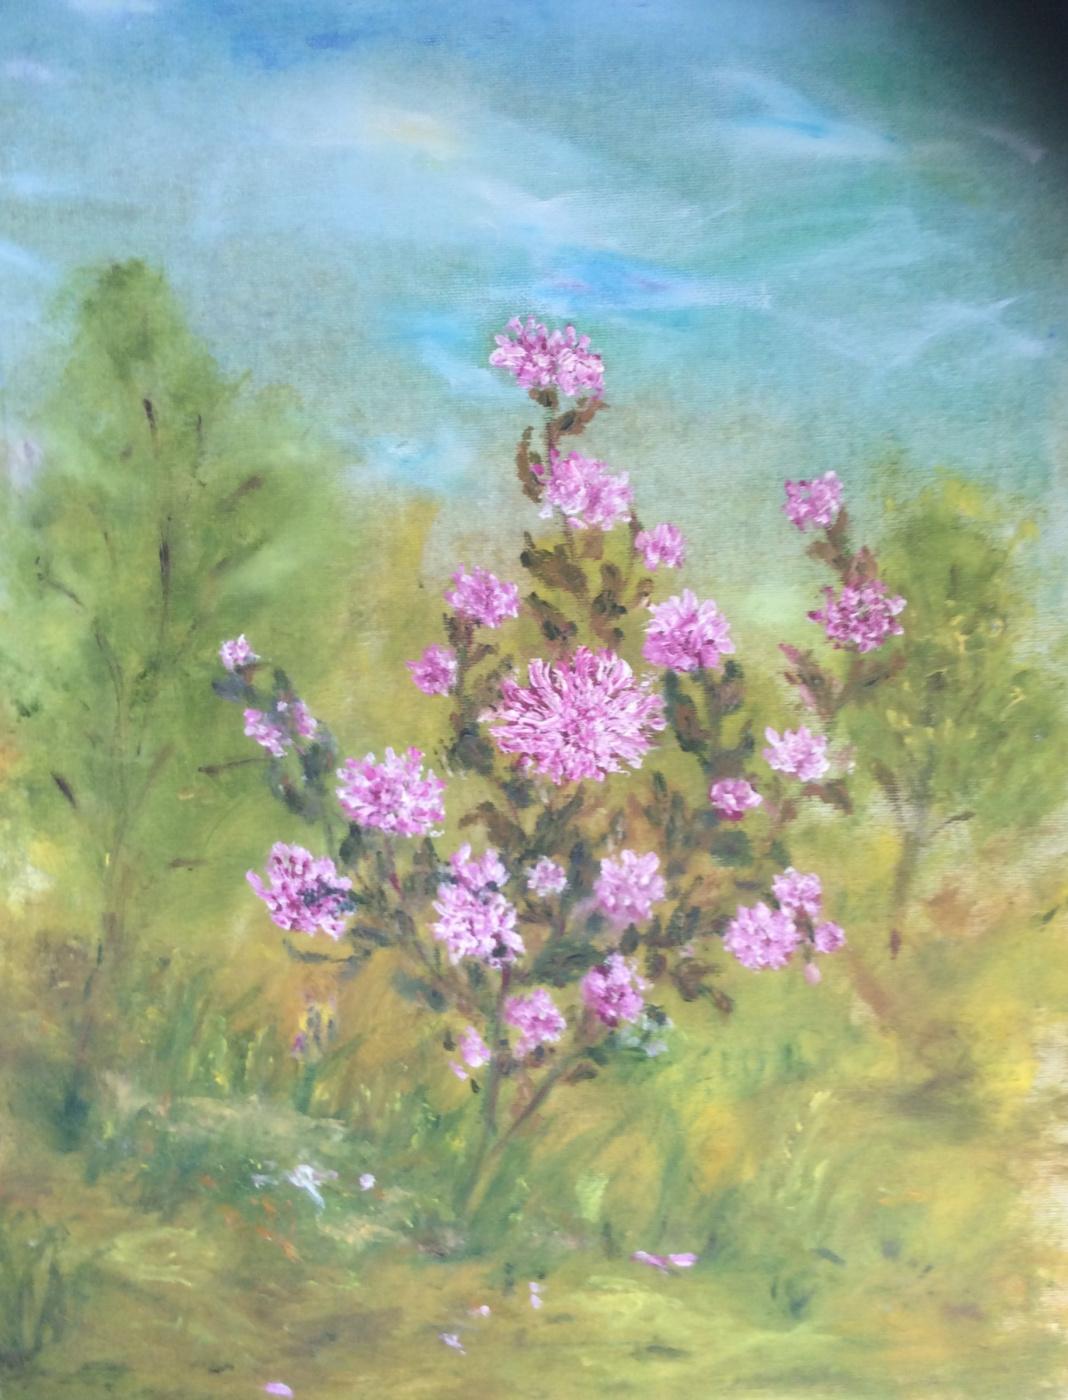 Rita Arkadievna Beckman. Chrysanthemums bloomed again